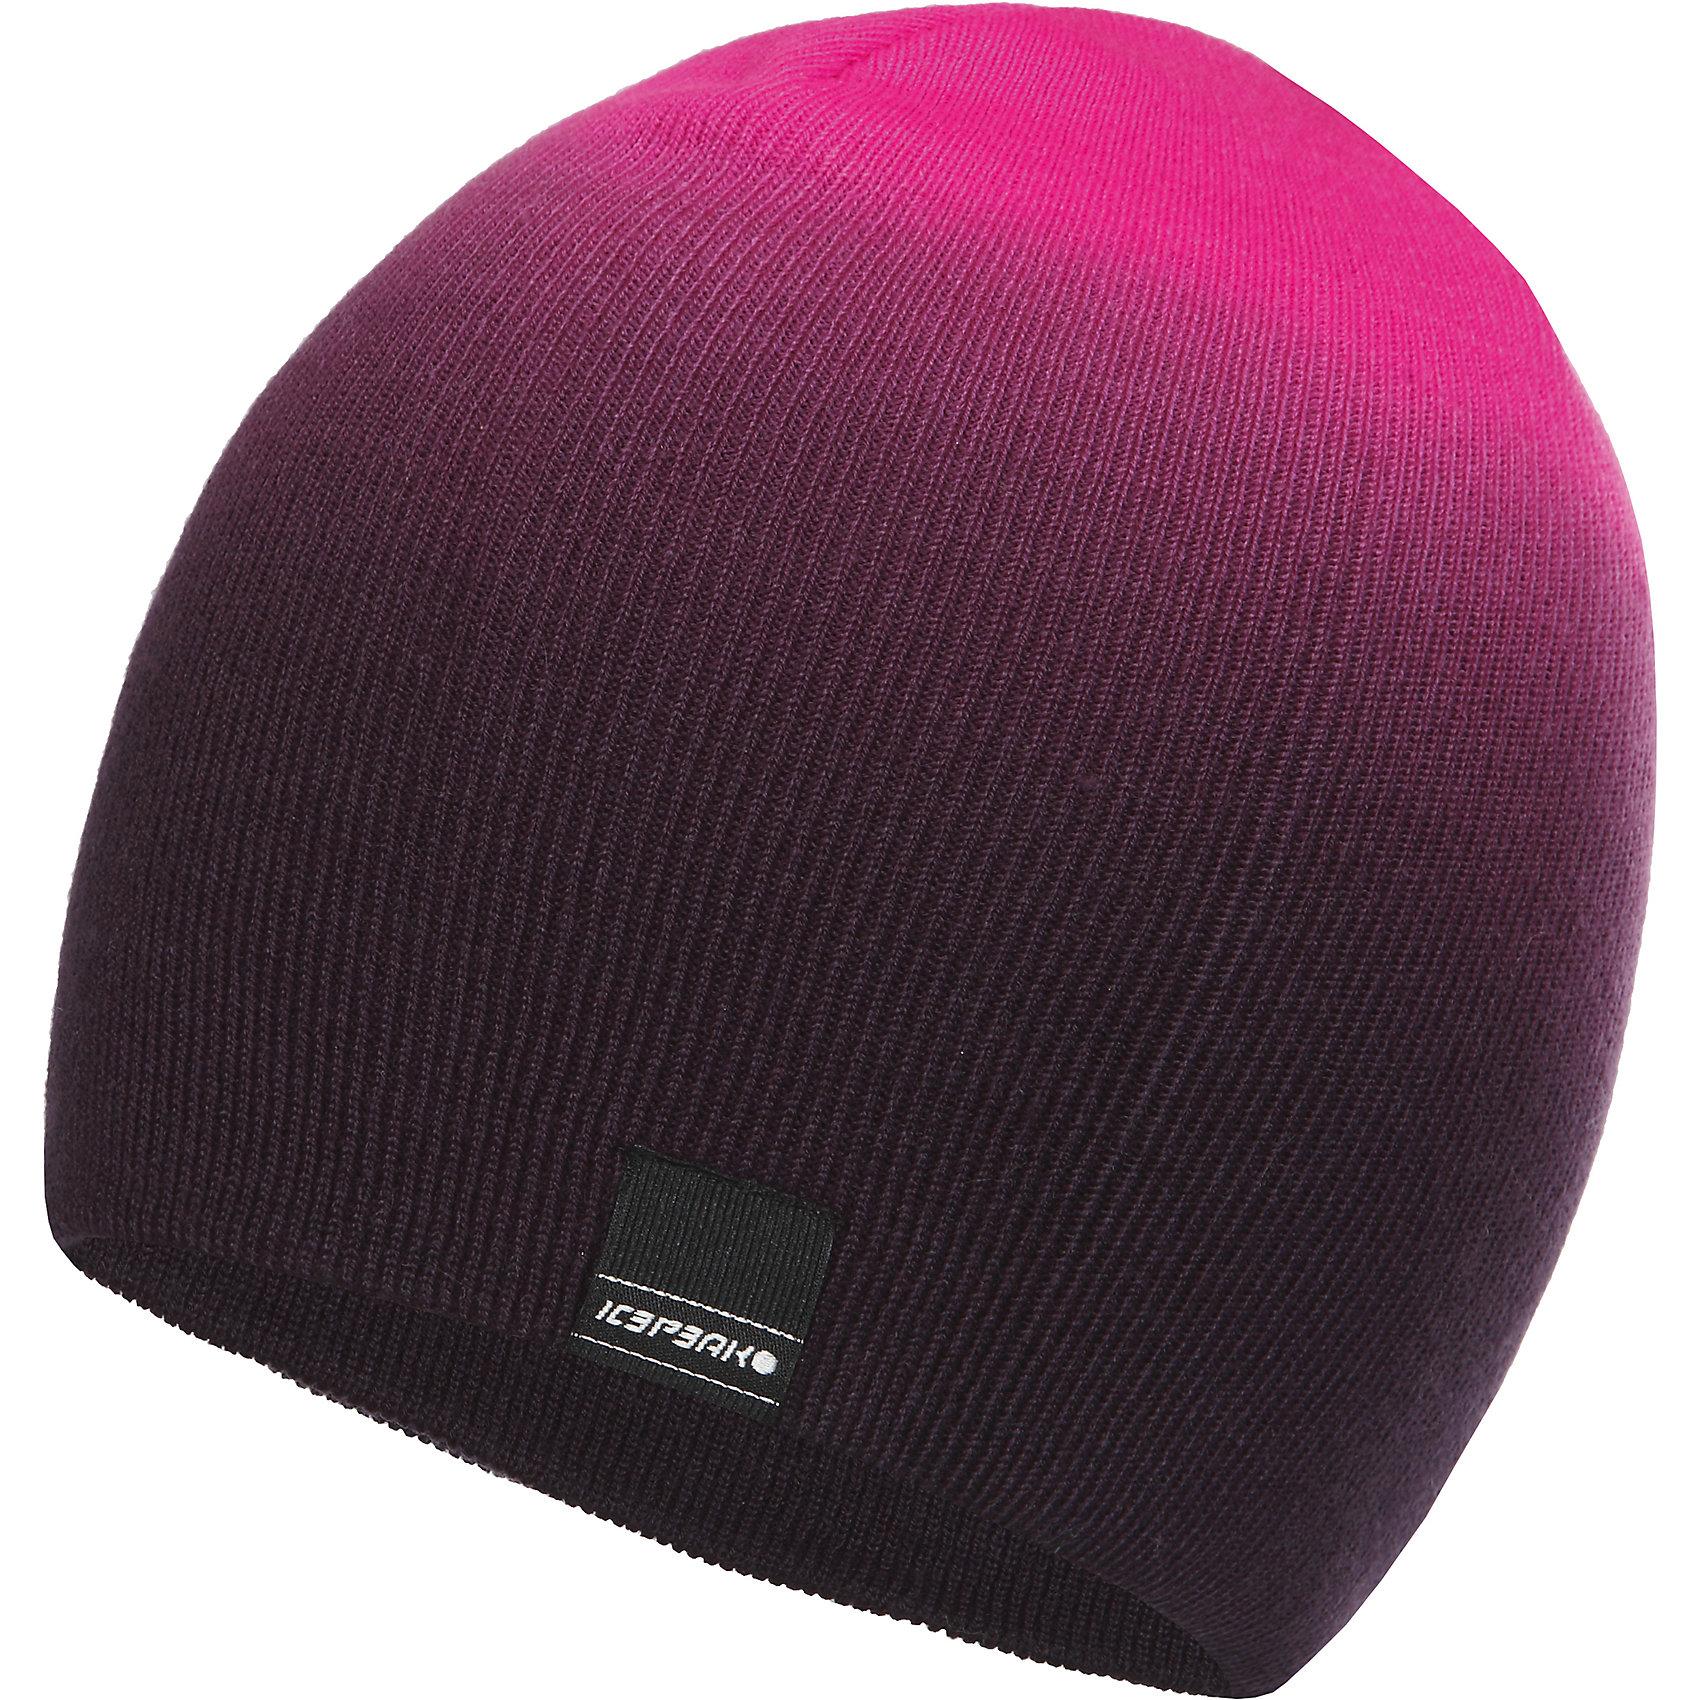 Шапка-шлем для девочки ICEPEAKШапки и шарфы<br>Шапка для девочки ICEPEAK. <br><br>Состав: 100% акрил <br><br>Шапка, трикотаж, классическая двойная вязка, граде.<br><br>Ширина мм: 89<br>Глубина мм: 117<br>Высота мм: 44<br>Вес г: 155<br>Цвет: розовый<br>Возраст от месяцев: 84<br>Возраст до месяцев: 96<br>Пол: Женский<br>Возраст: Детский<br>Размер: one size<br>SKU: 4221101